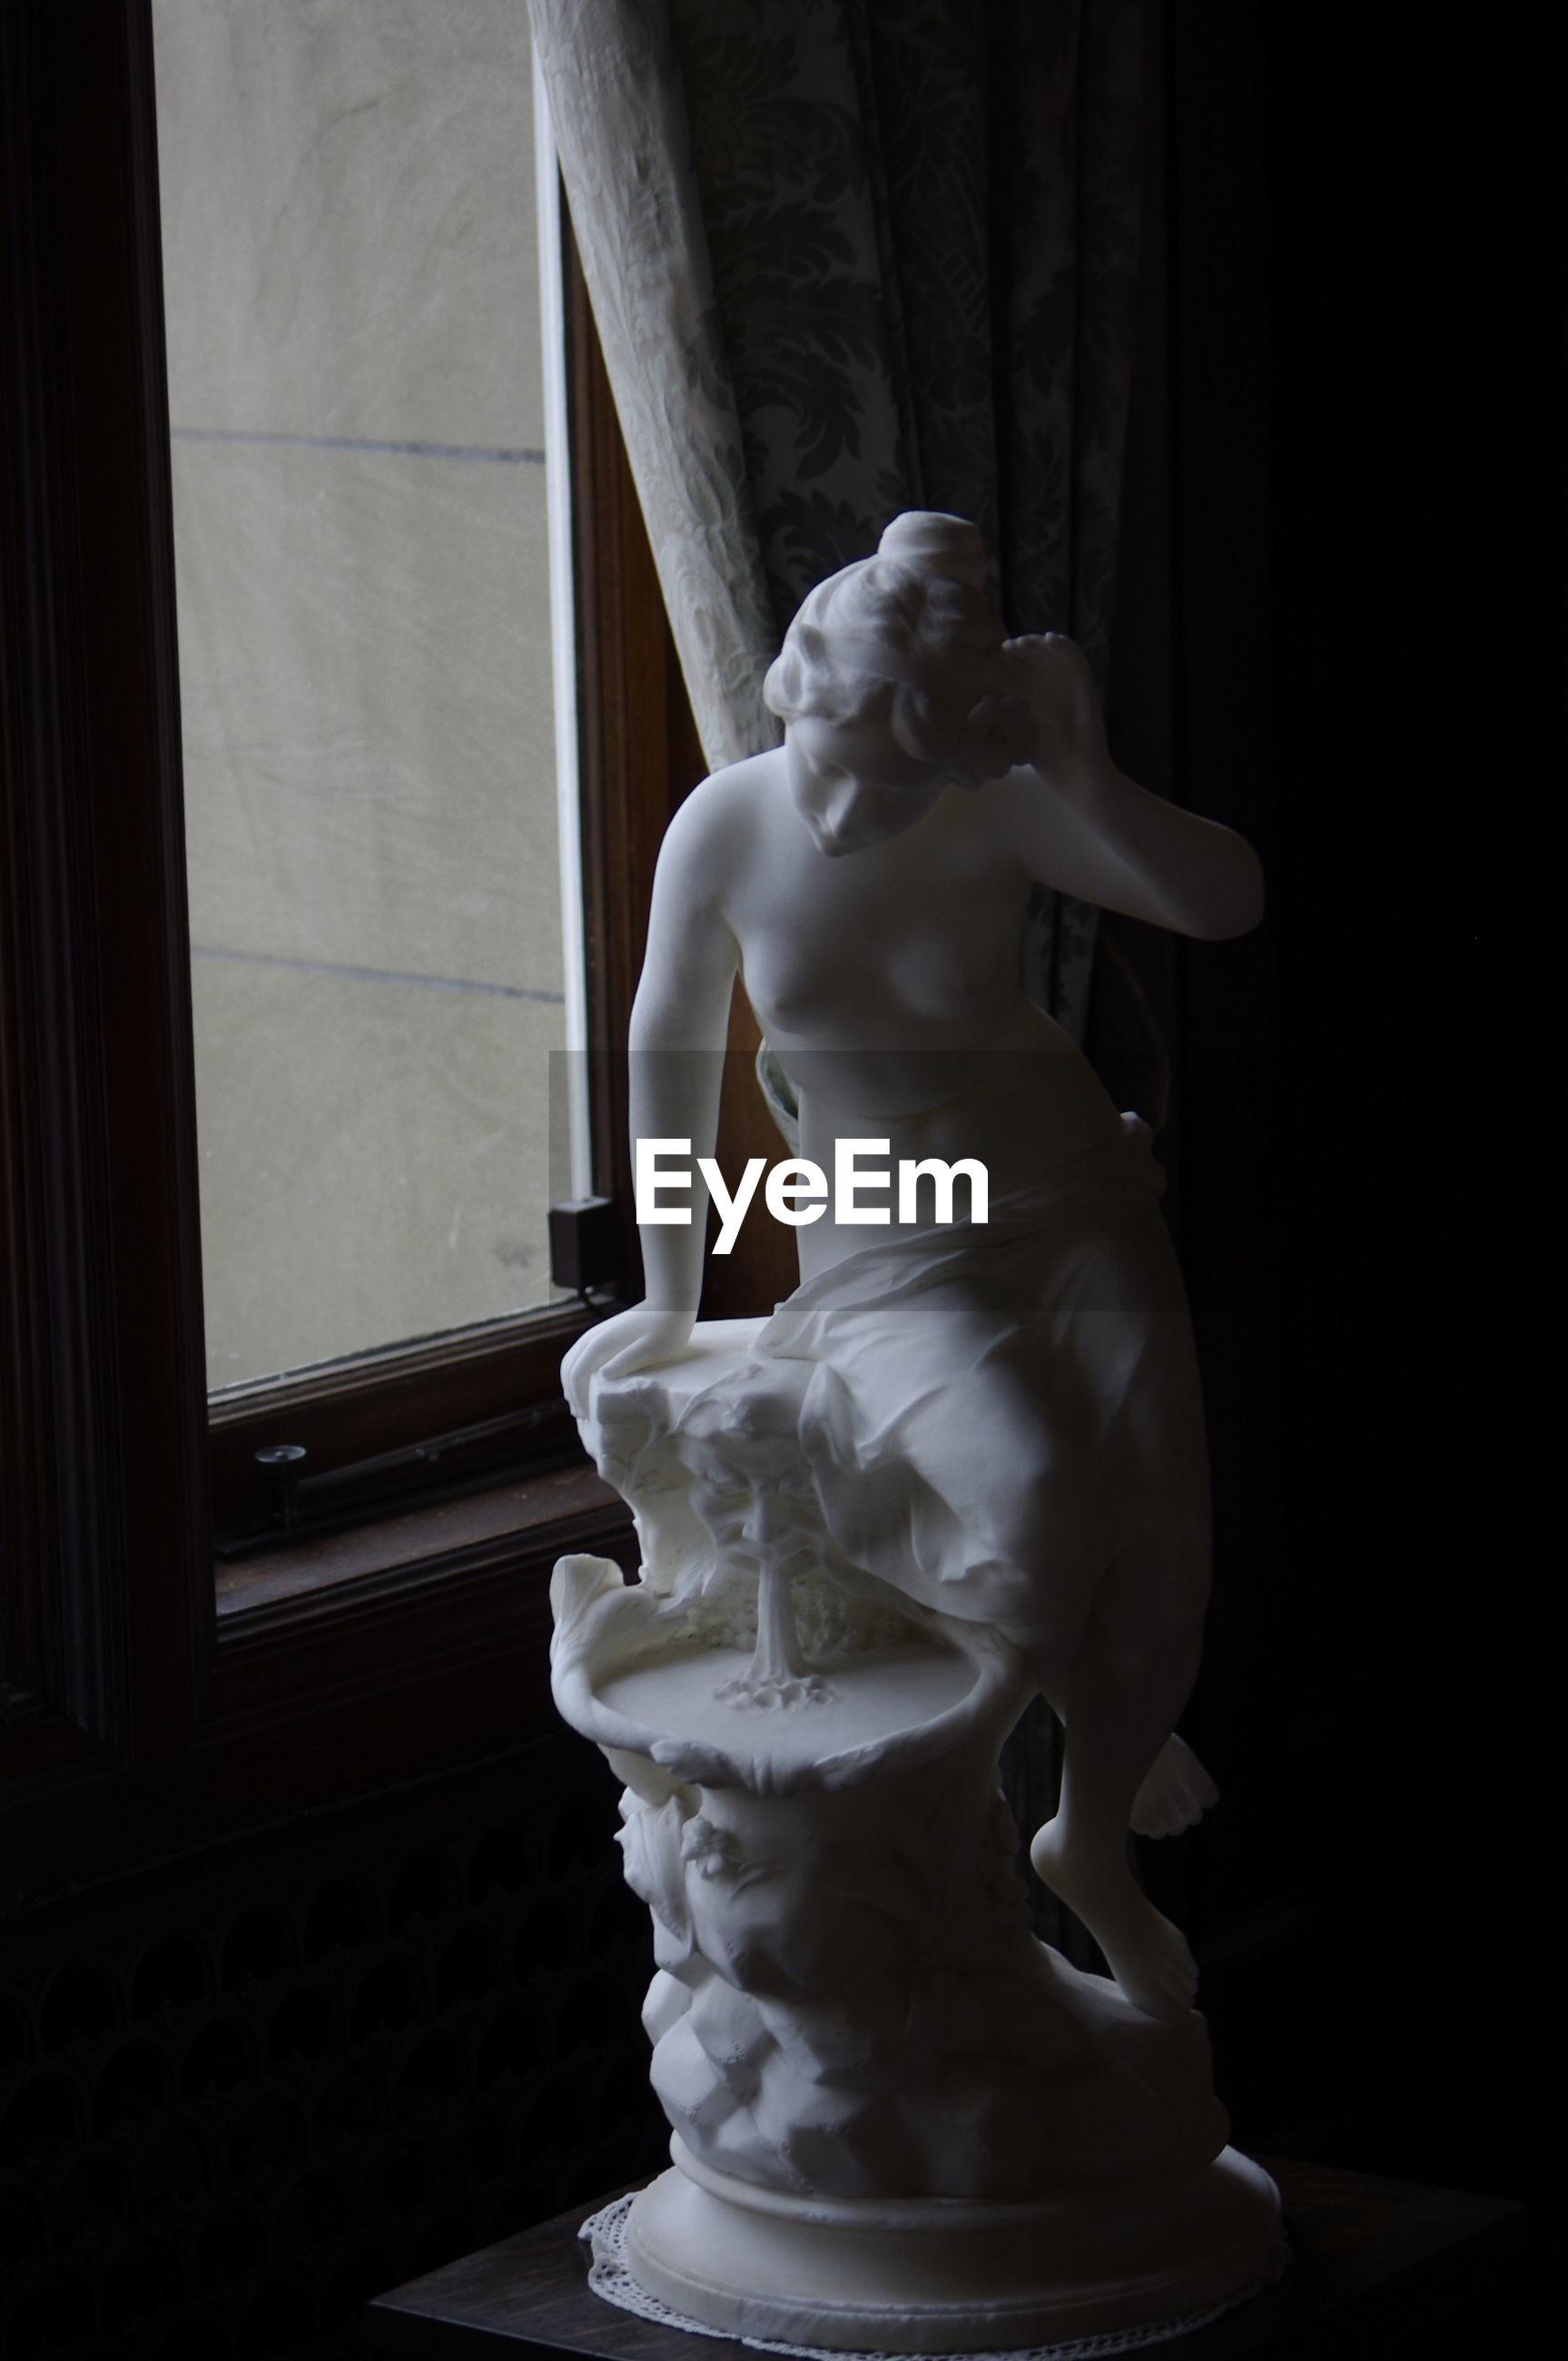 Statue by window in darkroom